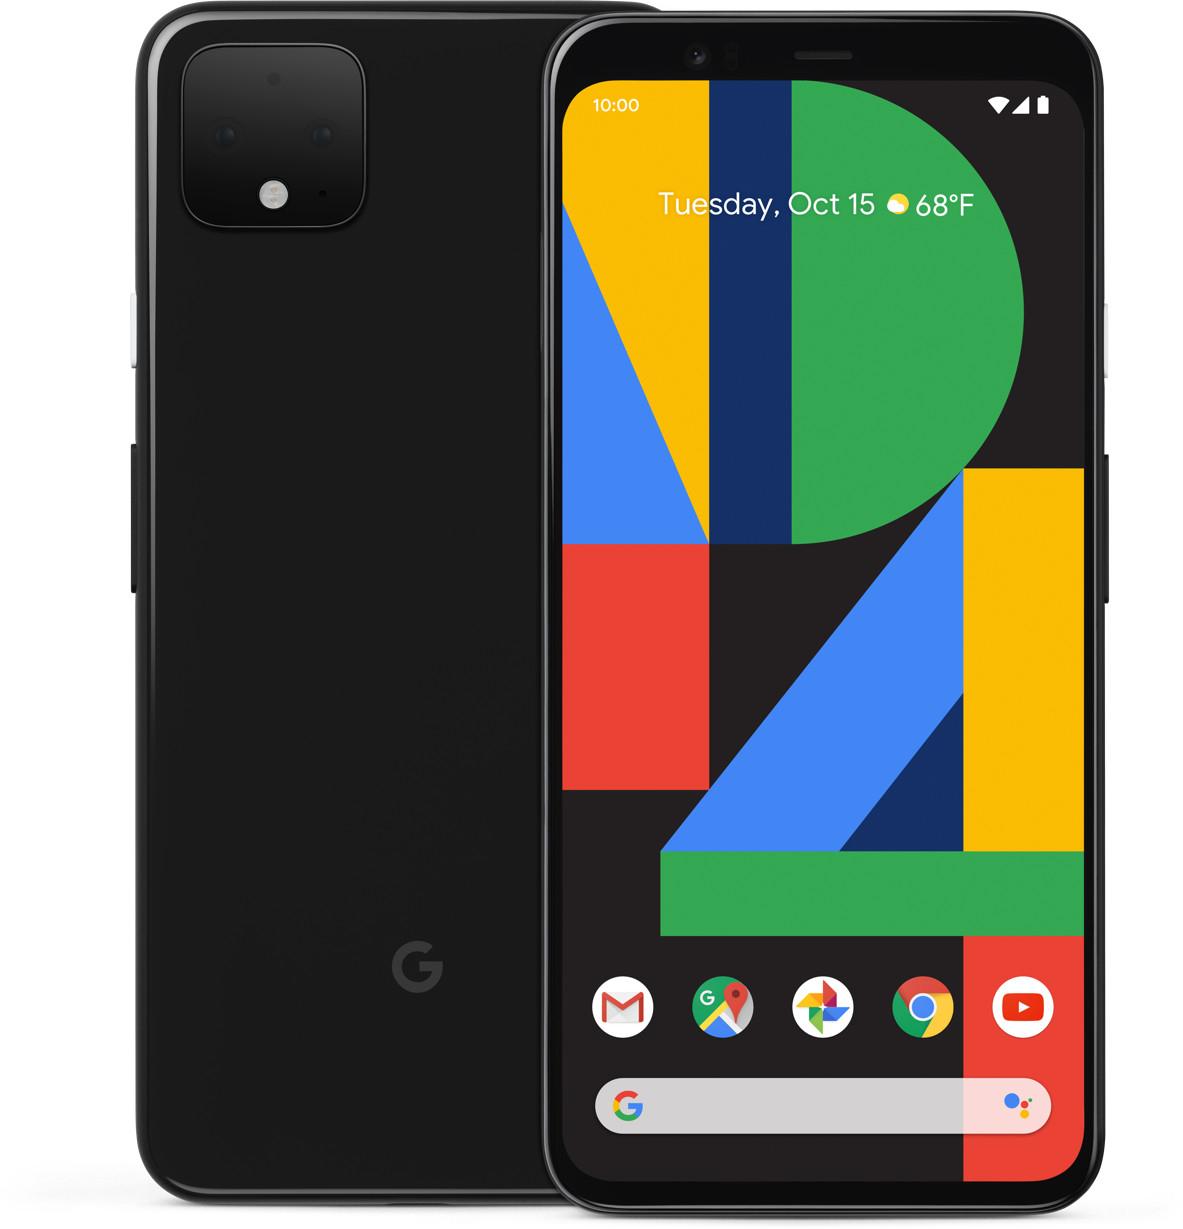 "Smartphone 6.3"" Google Pixel 4 XL - WQHD+, SnapDragon 855, 6 Go de RAM, 64 Go, Android 10, blanc ou noir"